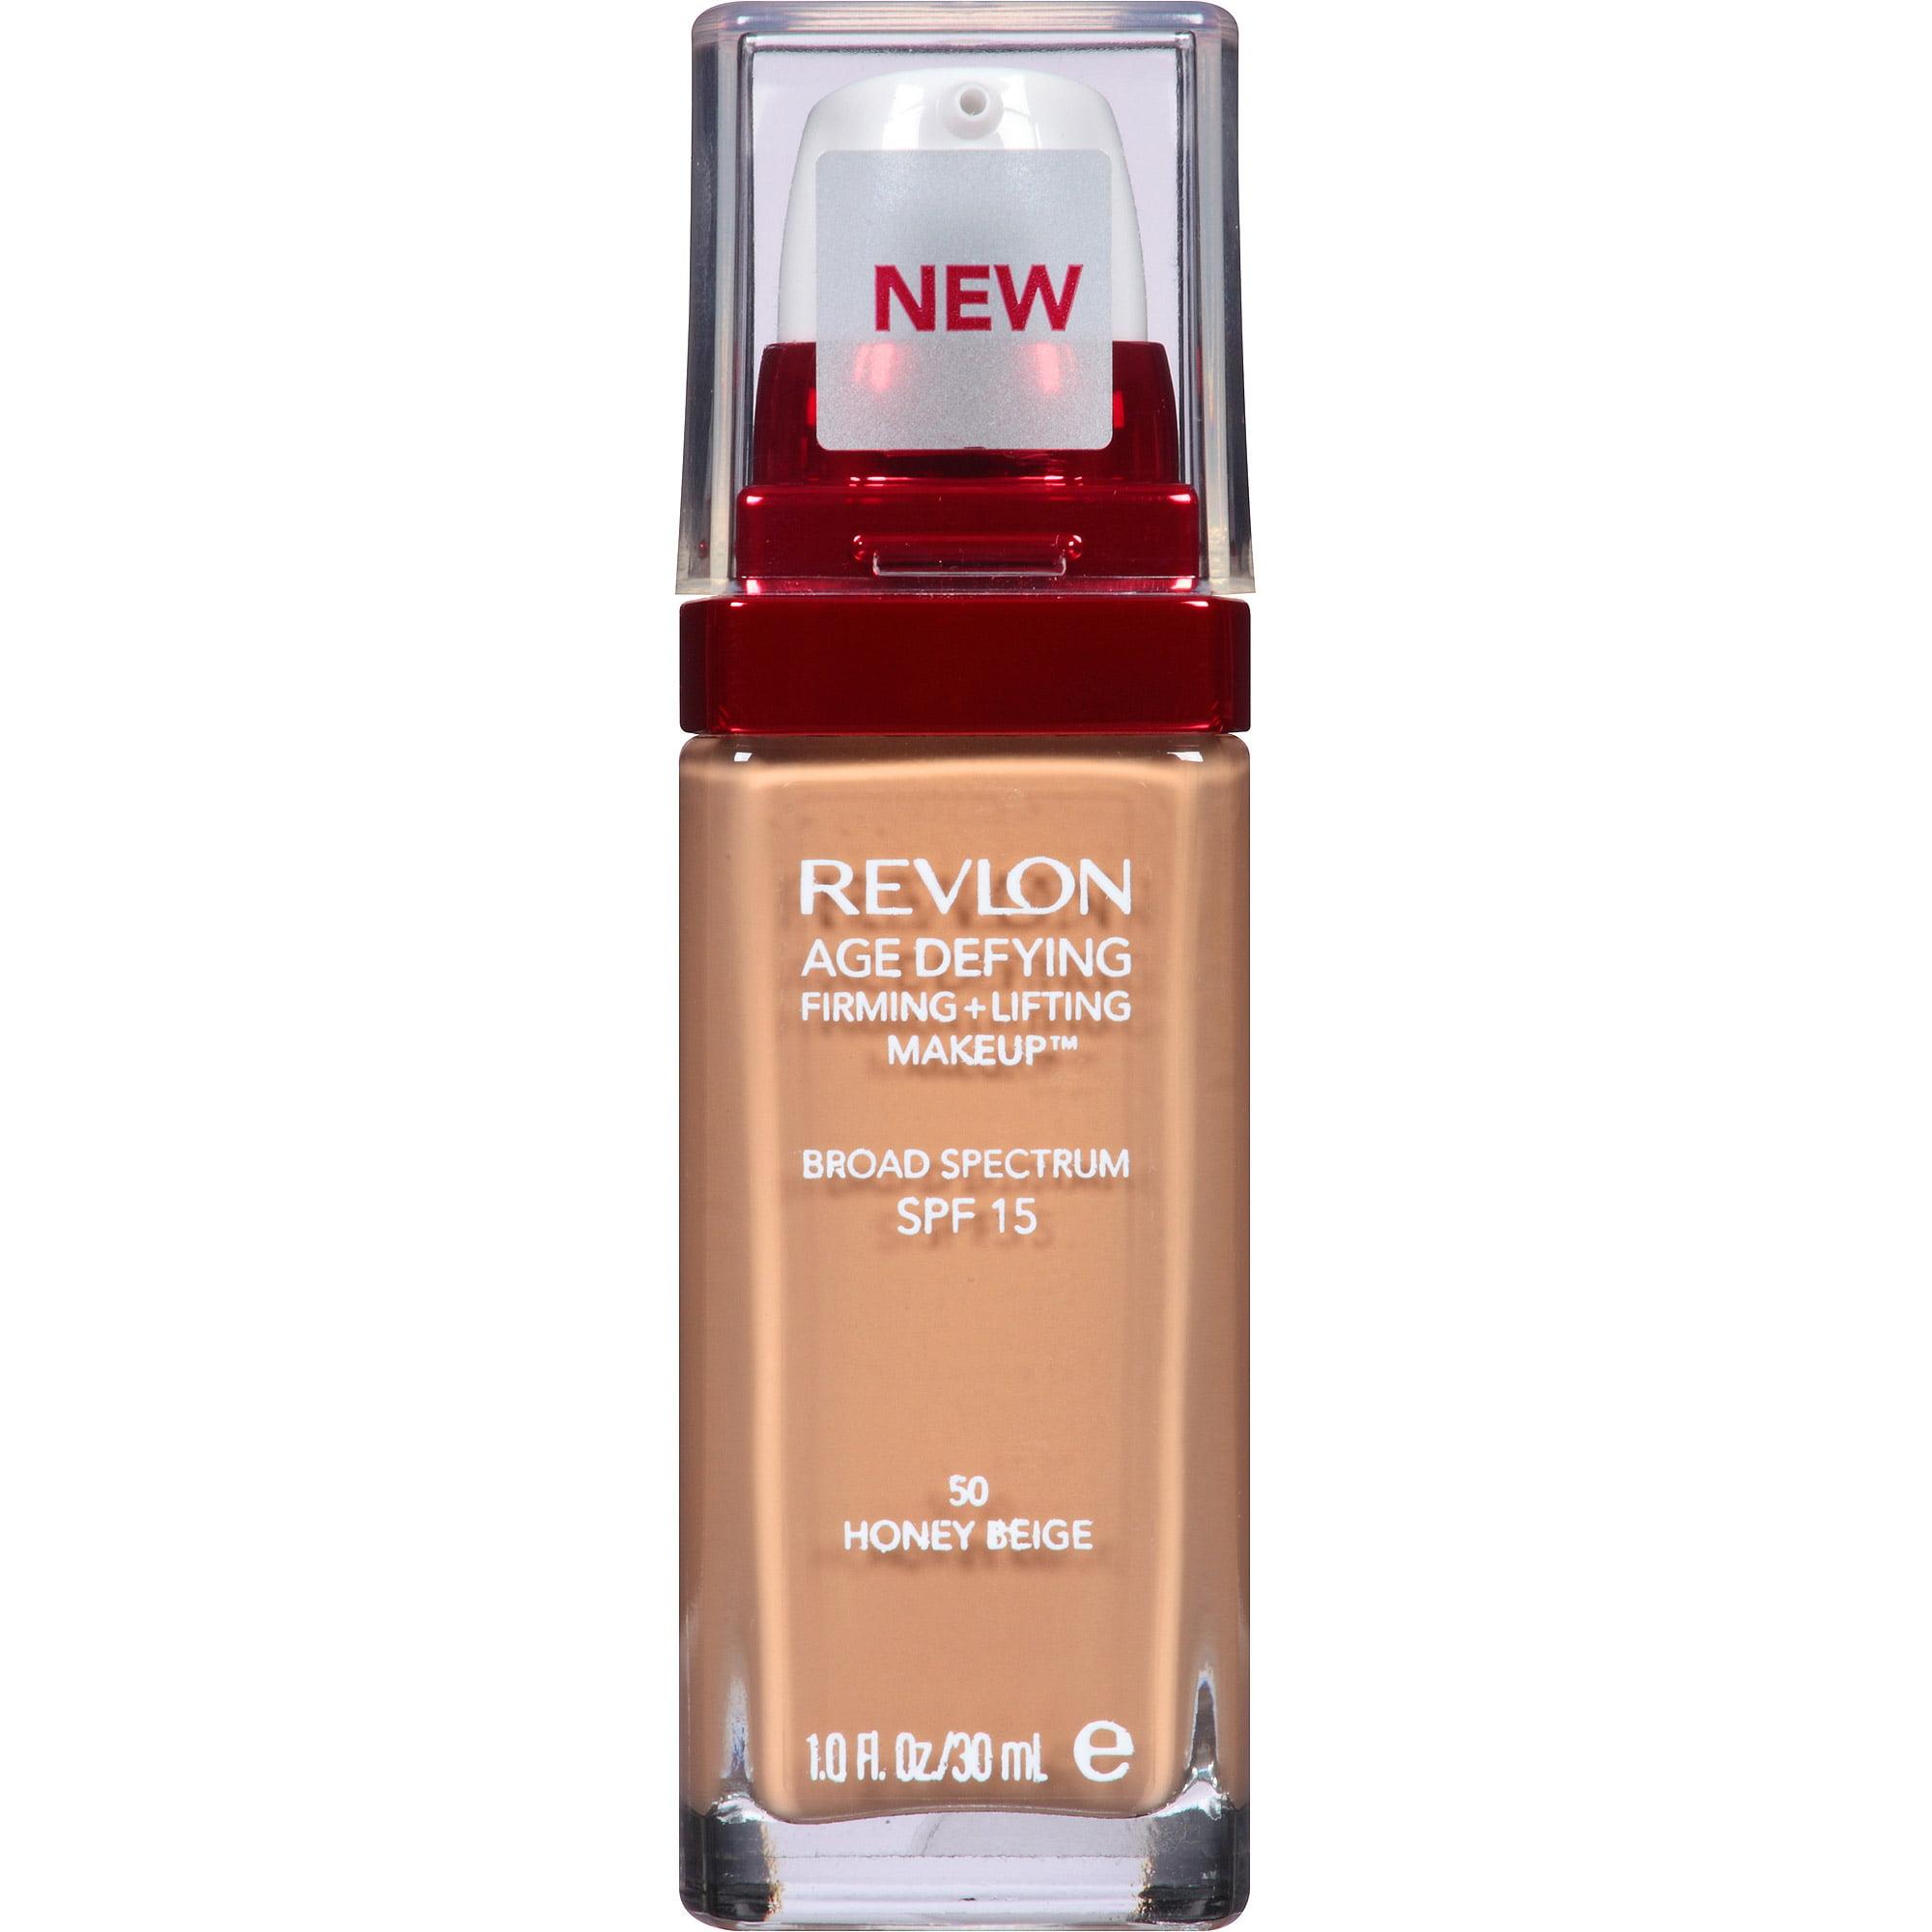 Revlon Age Defying Firming + Lifting Makeup, 50 Honey Beige, 1 fl oz